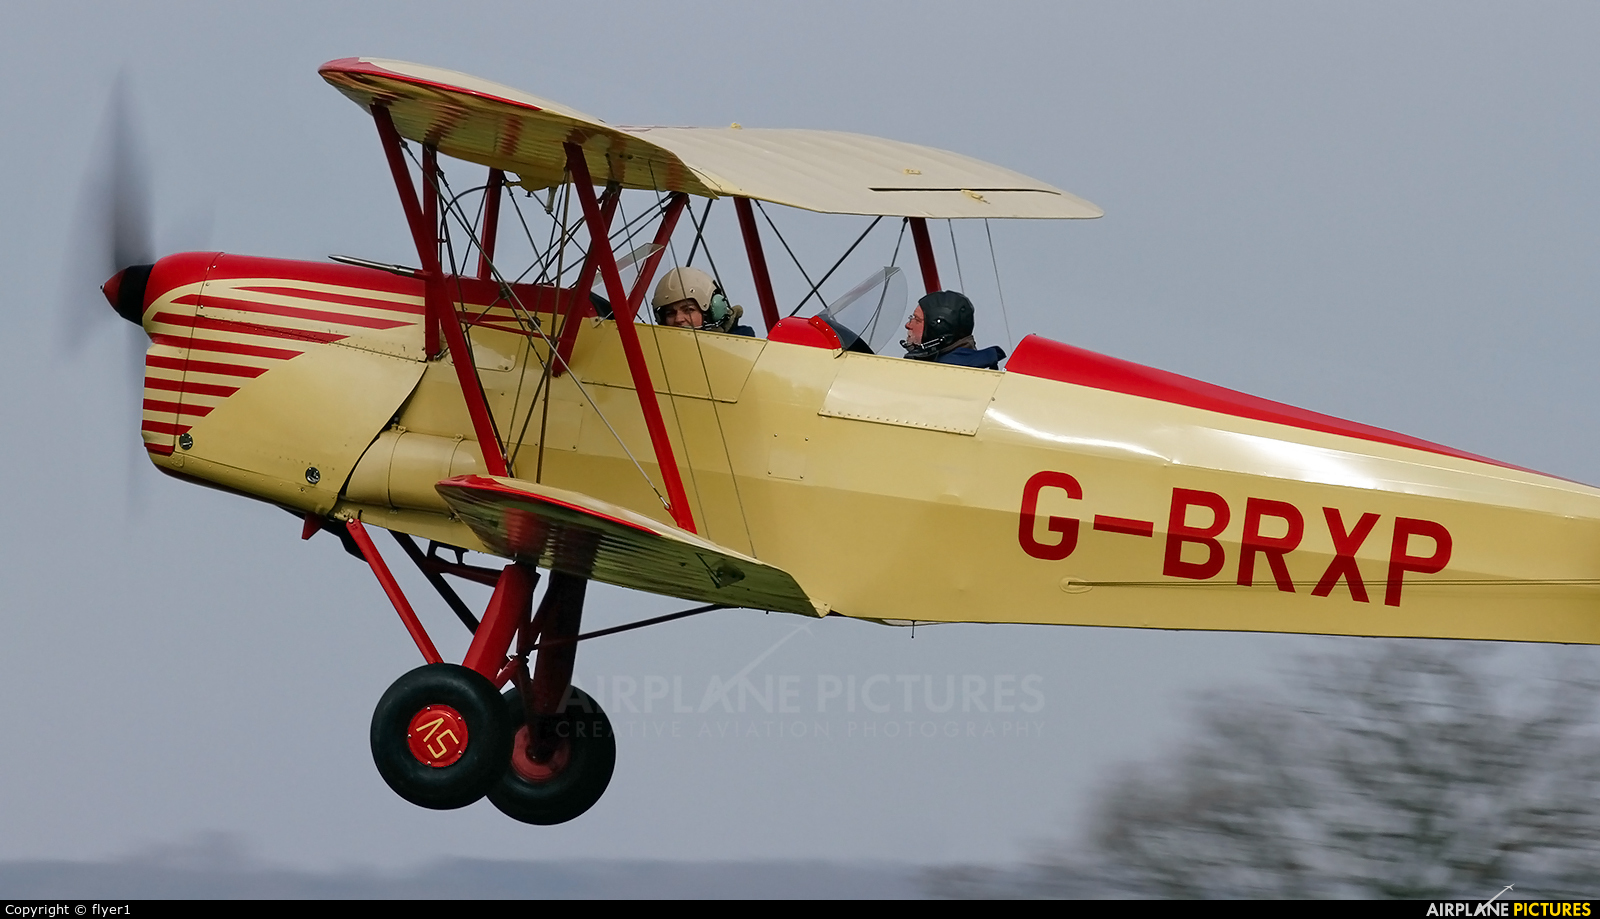 Private G-BRXP aircraft at Lashenden / Headcorn